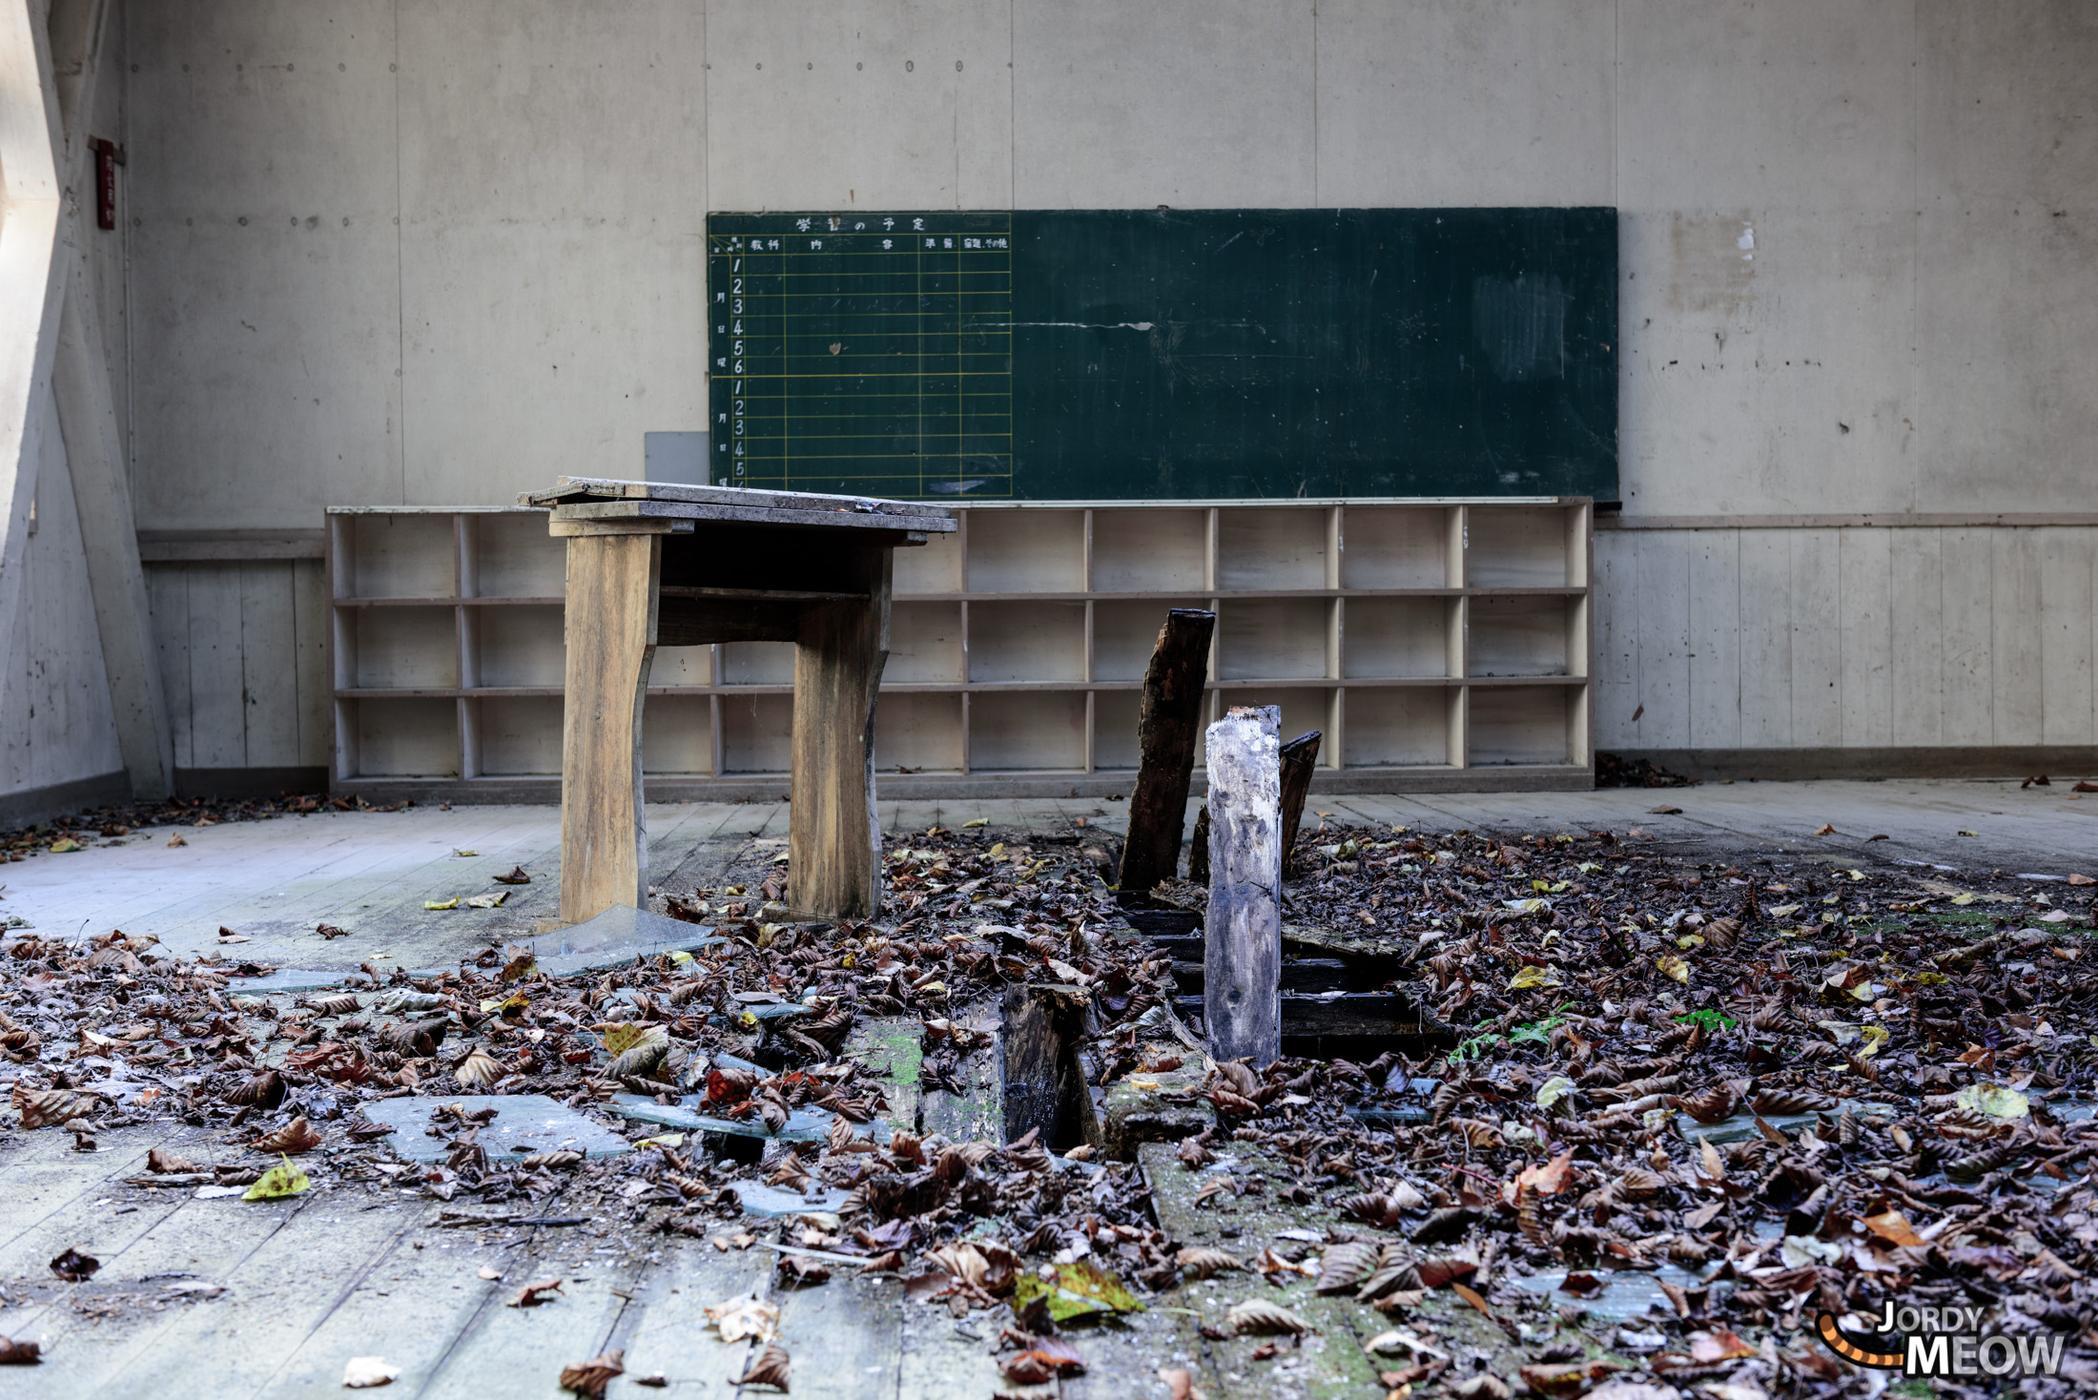 abandoned, chichibu, haikyo, japan, japanese, kanto, ruin, saitama, school, urban exploration, urbex